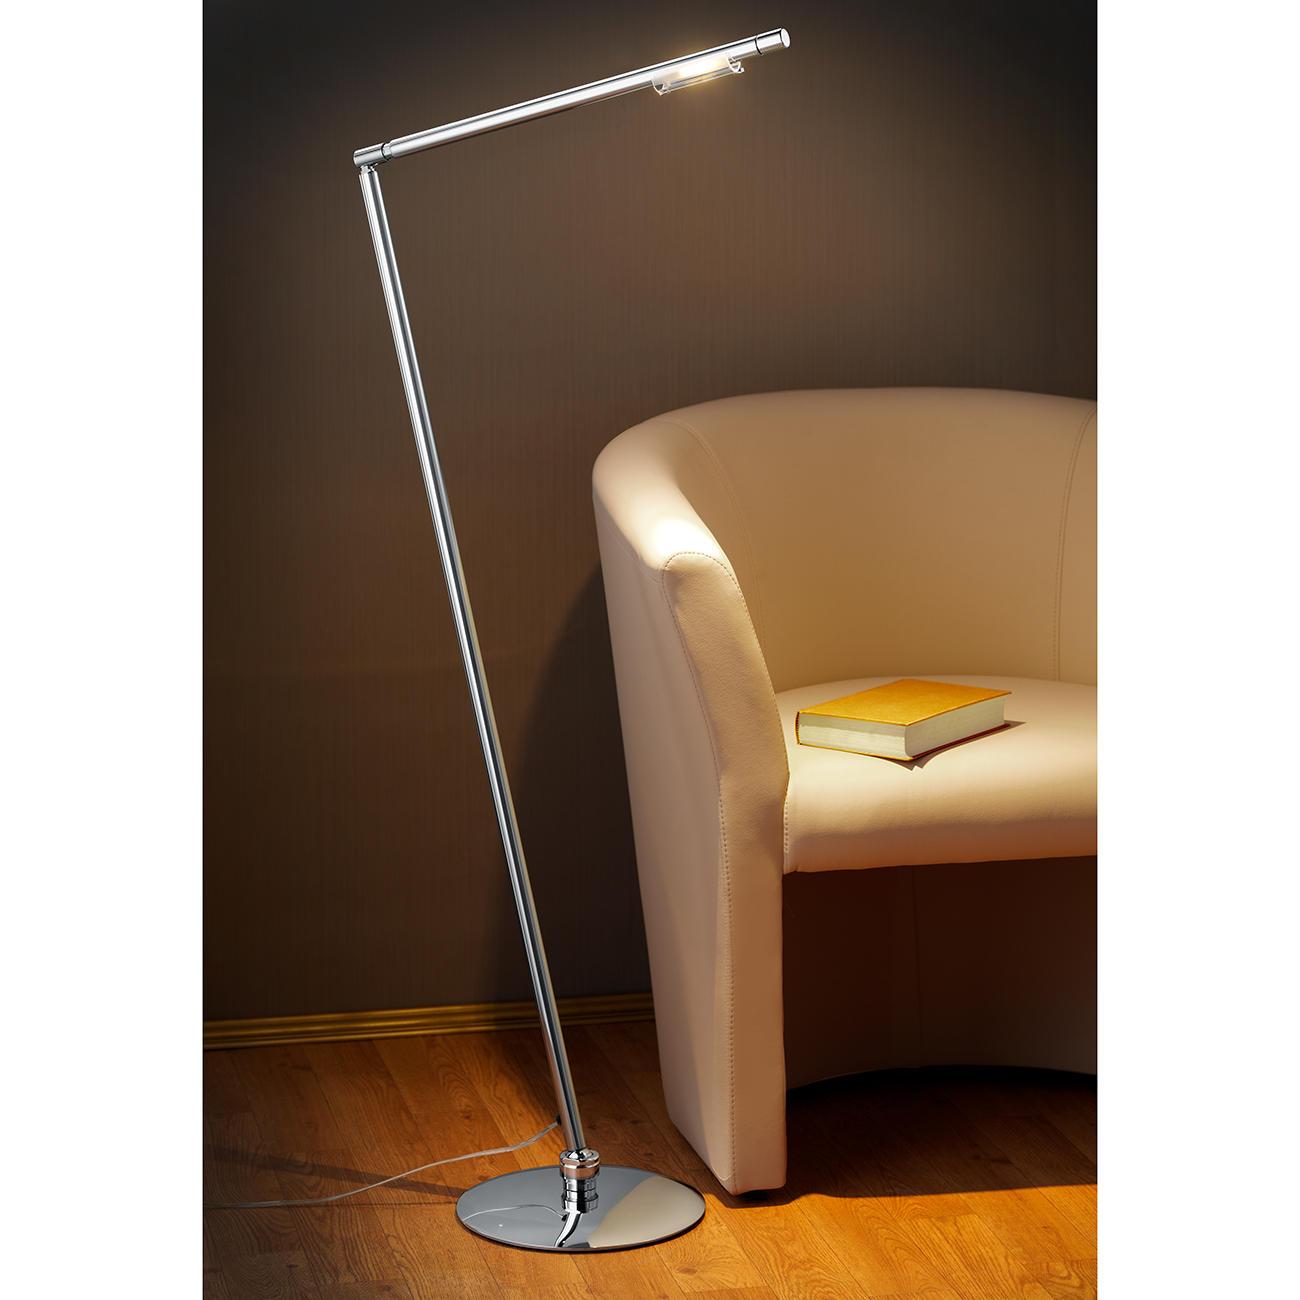 staande lamp tubi 3 jaar productgarantie pro idee. Black Bedroom Furniture Sets. Home Design Ideas